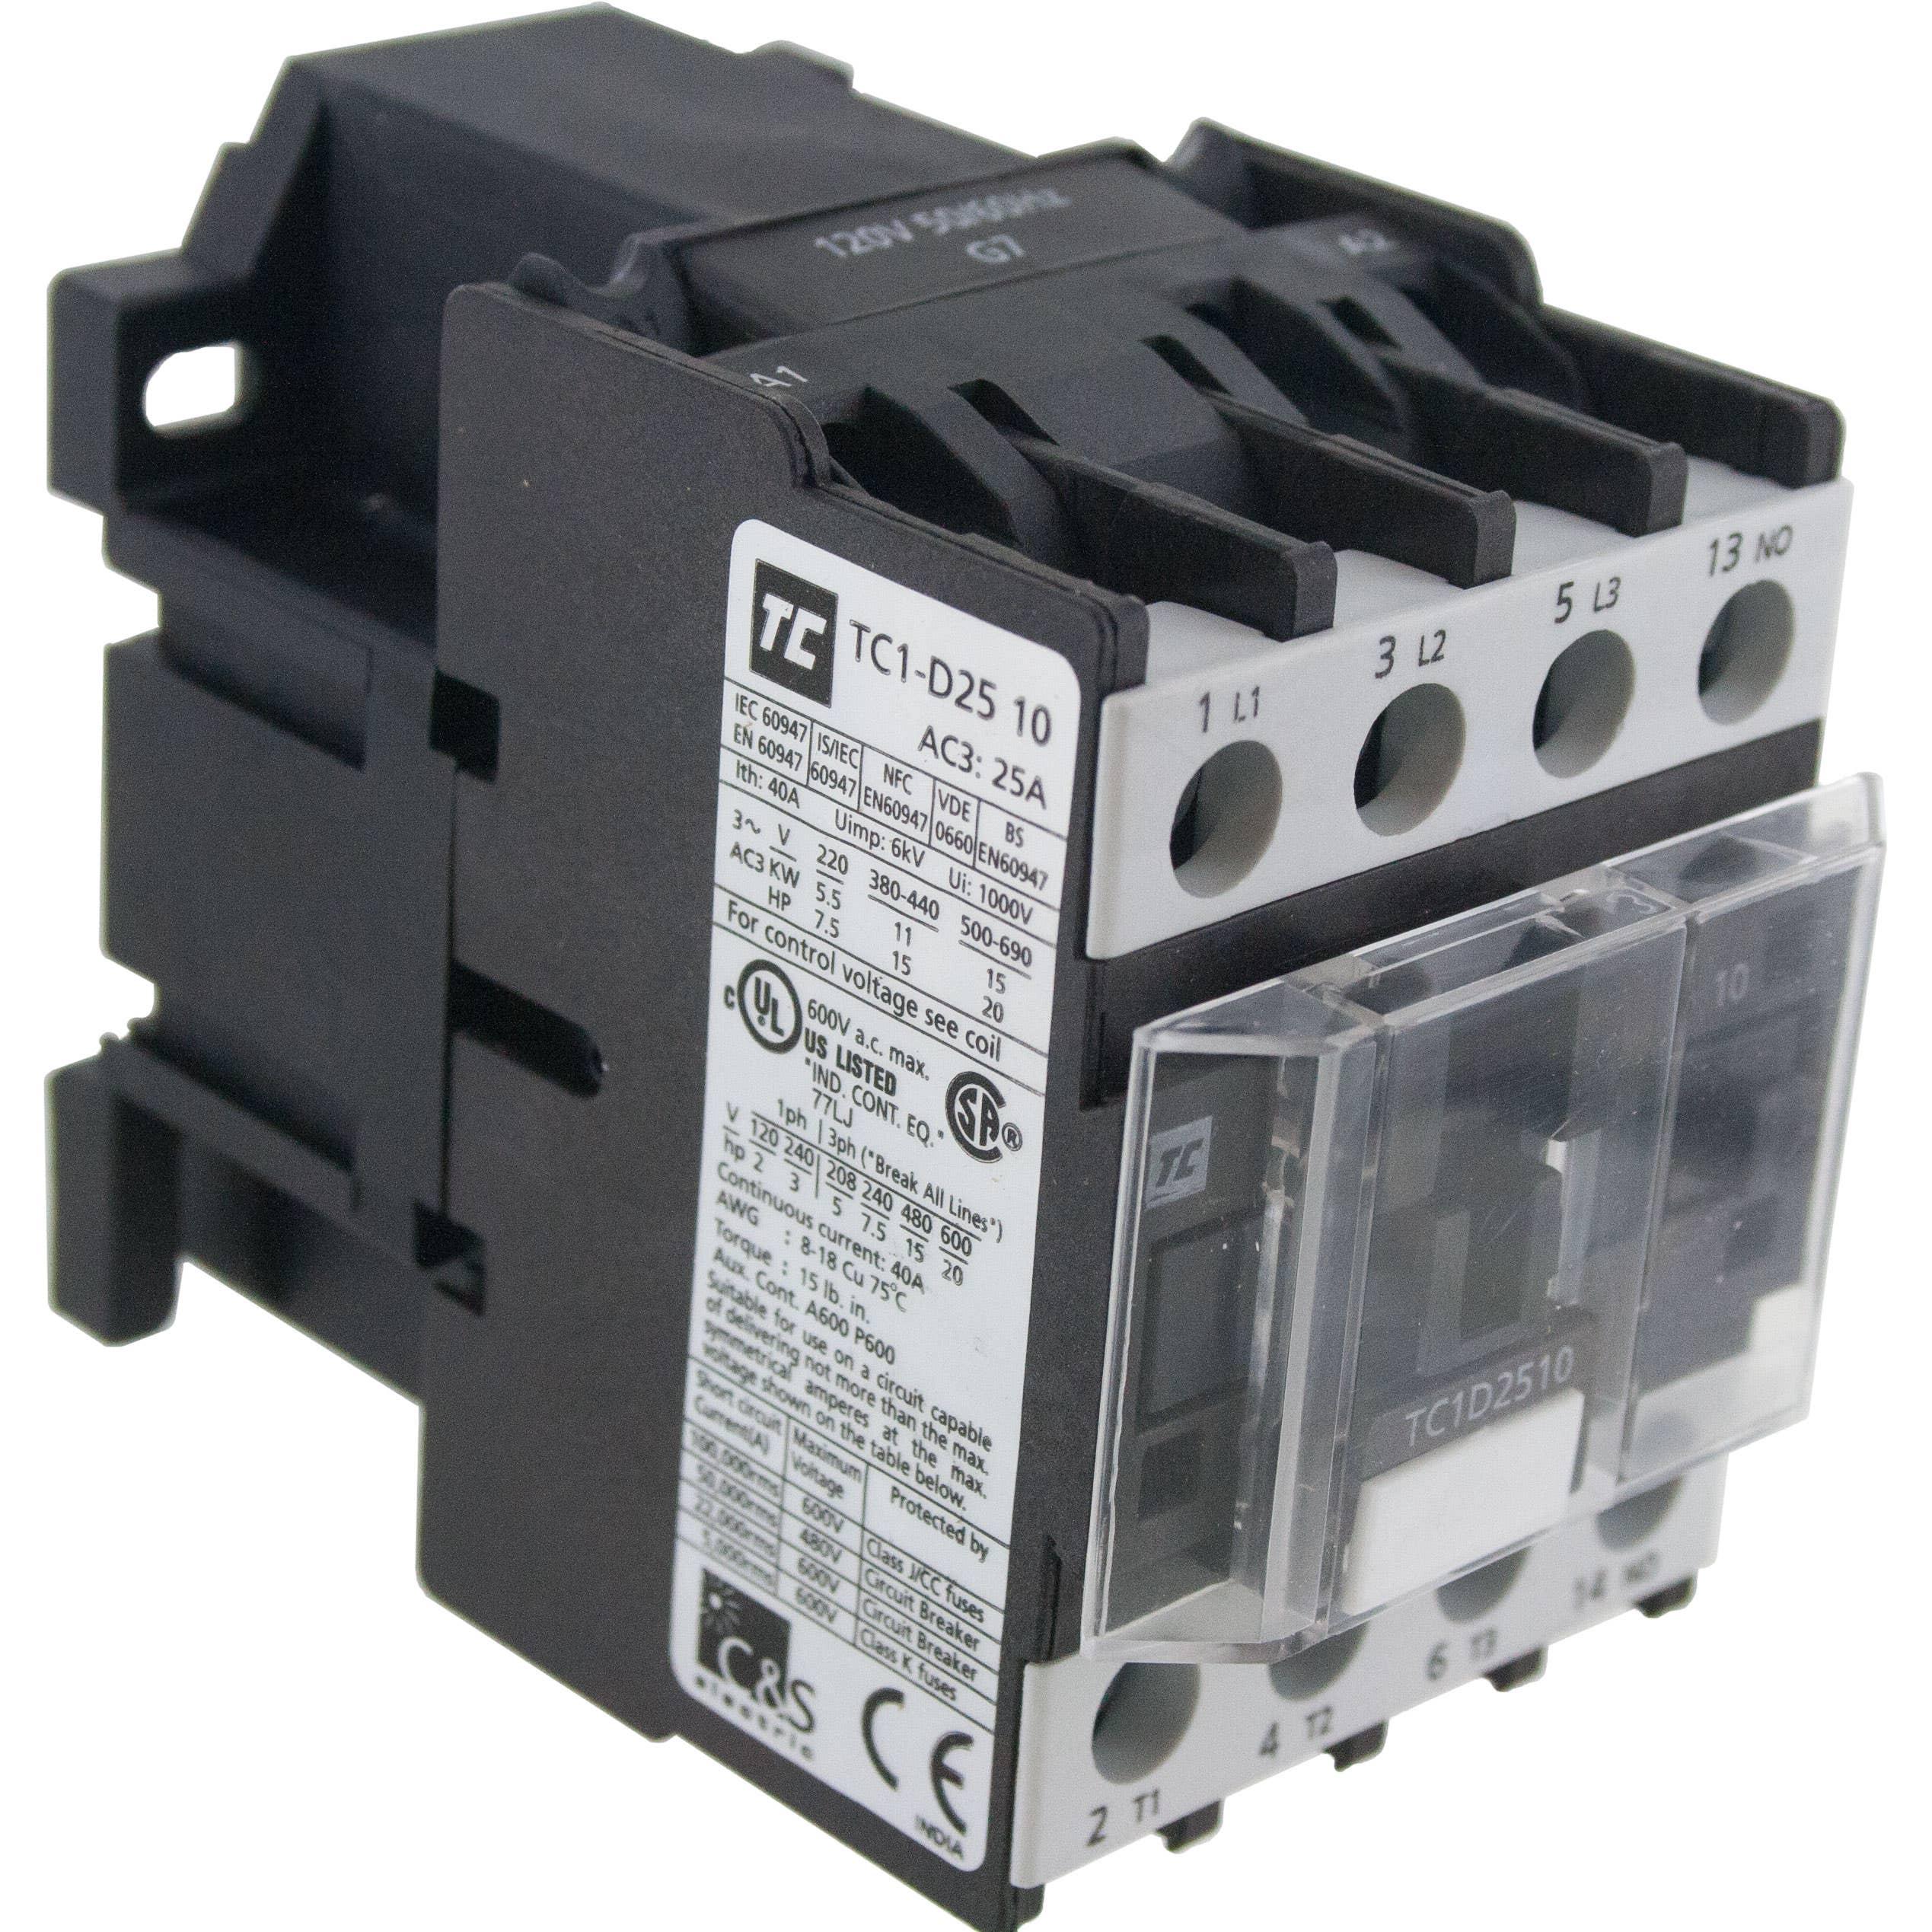 220 Volt 2 Pole Contactor Wiring Start Building A Diagram Ge 4 Control 3 25 Amp 1 N O 240 Ac Coil Elecdirect Rh Com Goodman